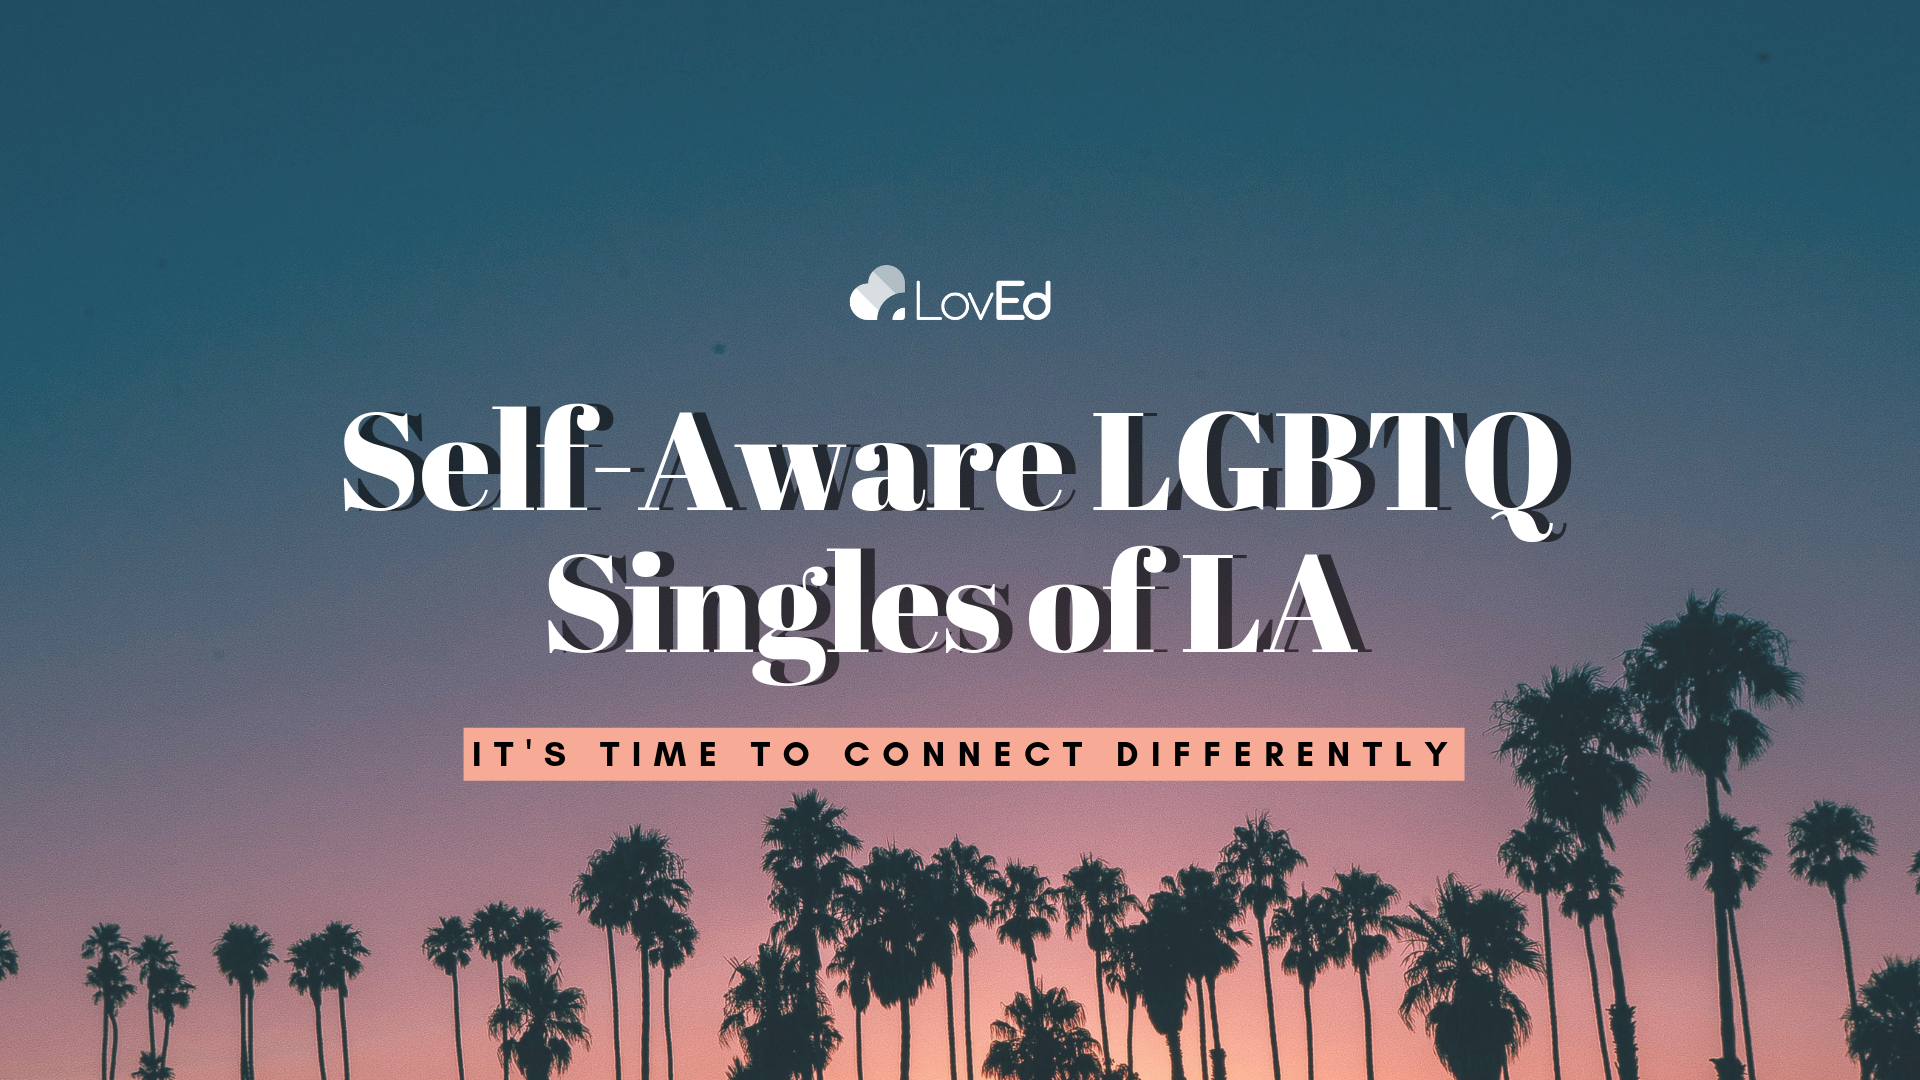 Self-Aware LGBTQ Singles of LA